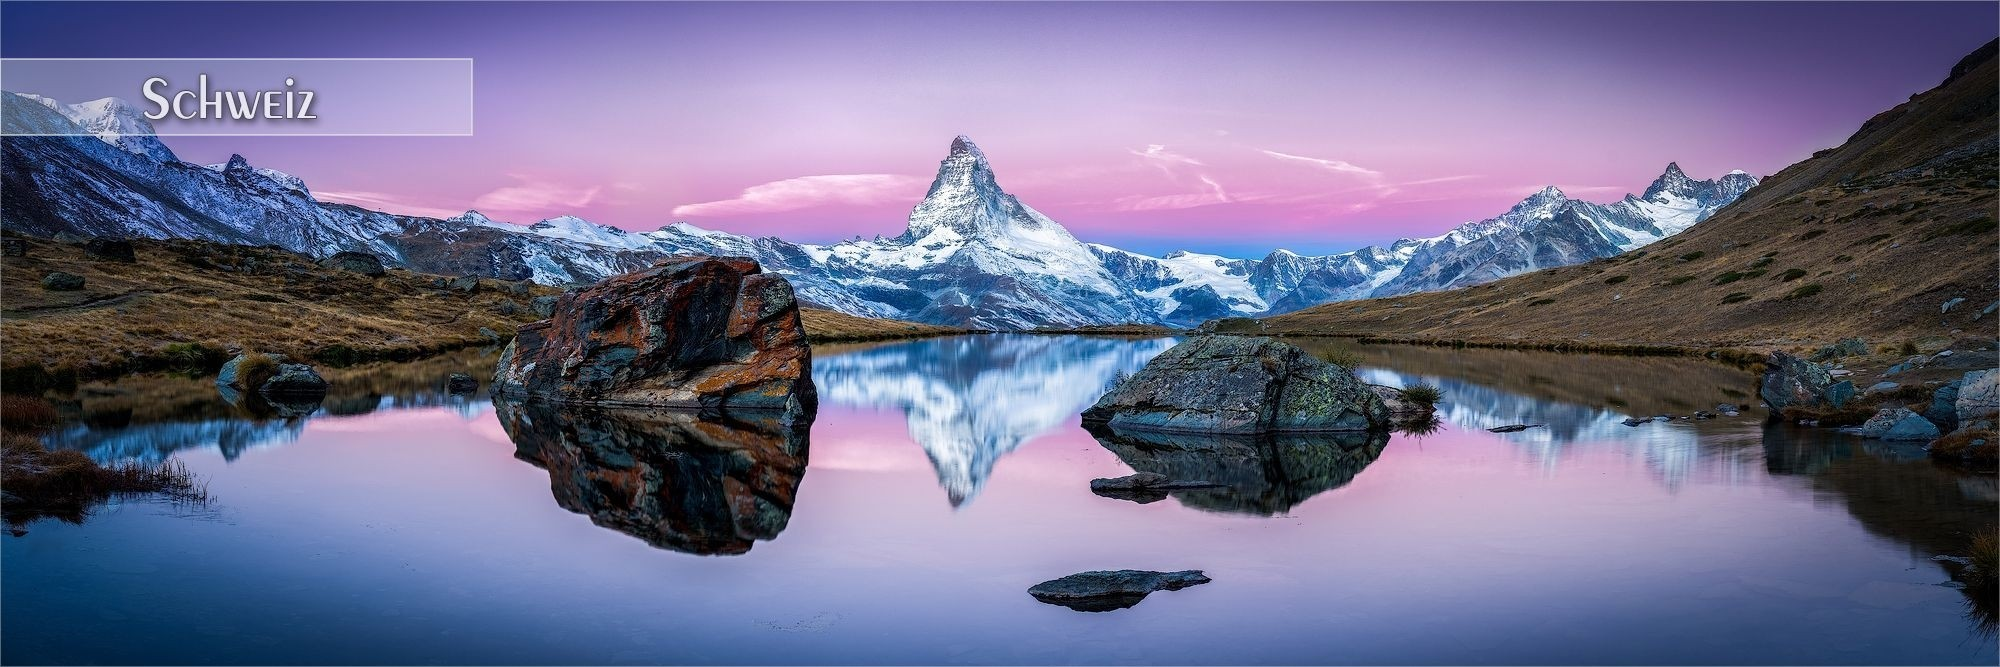 FineArt & Panoramafotografien aus der Schweiz